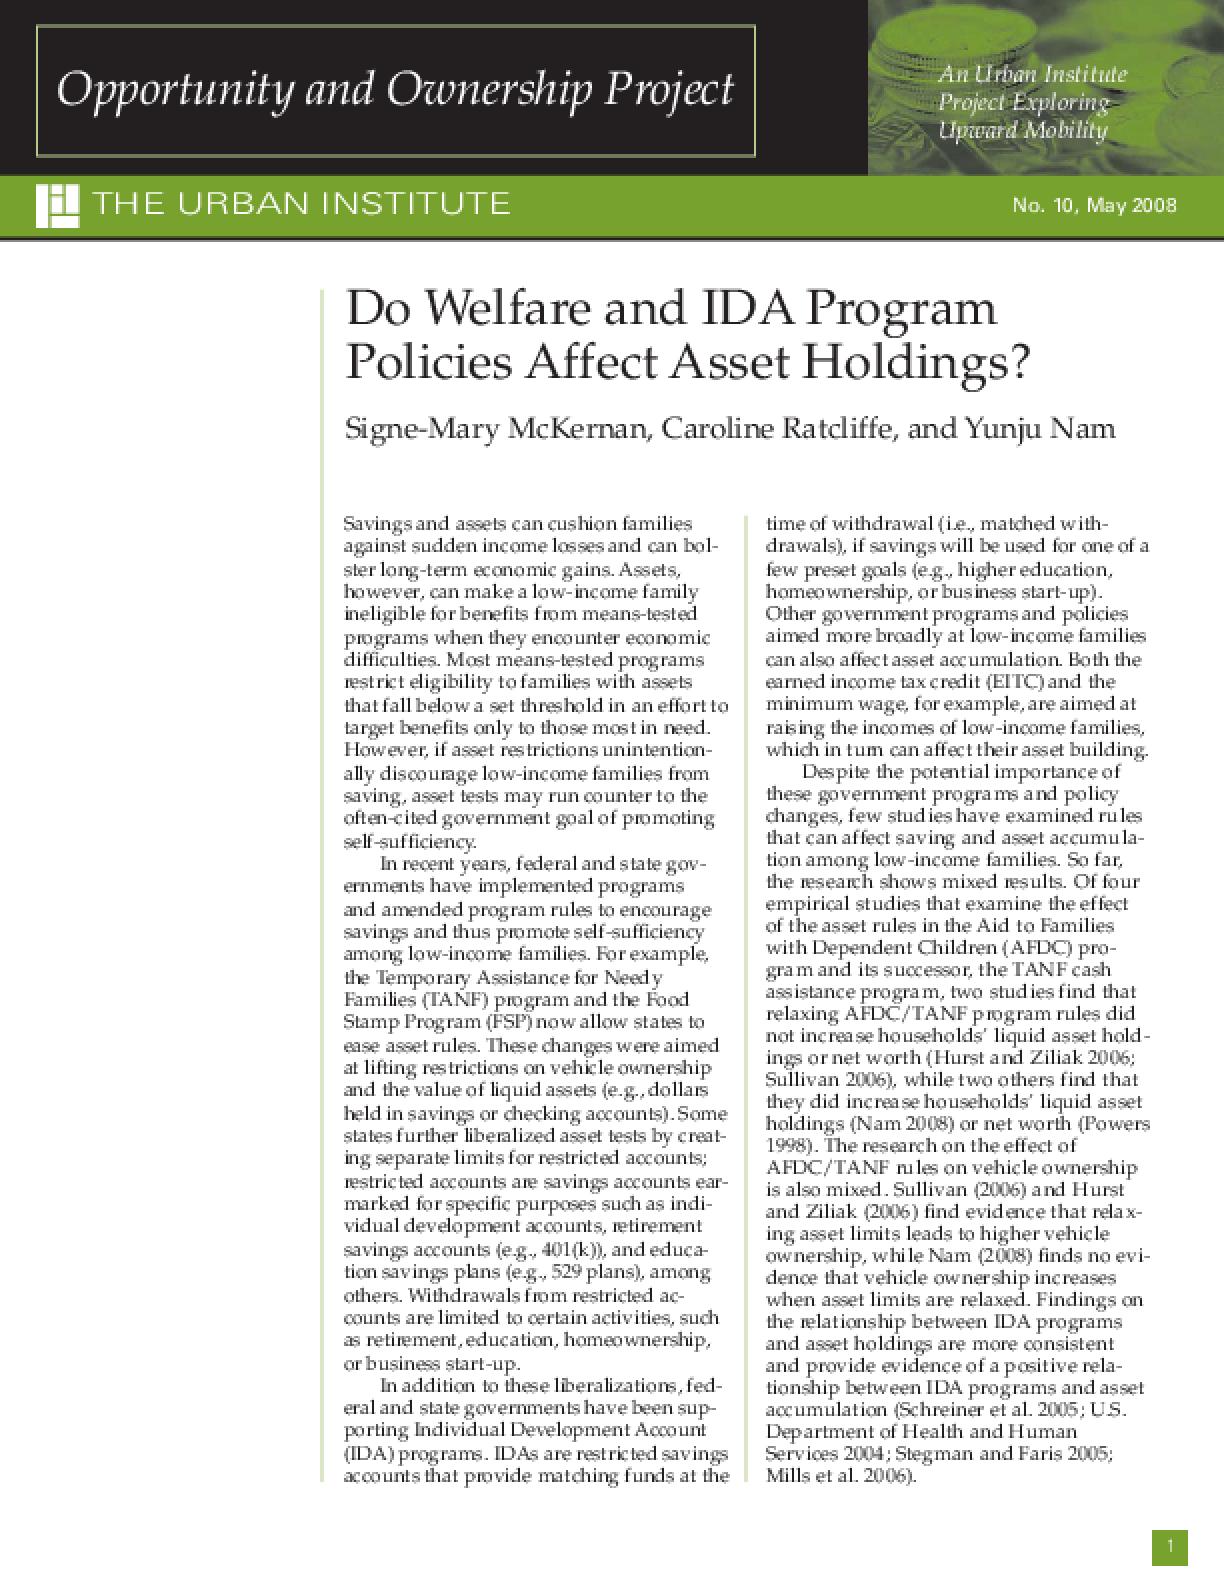 Do Welfare and IDA Program Policies Affect Asset Holdings?